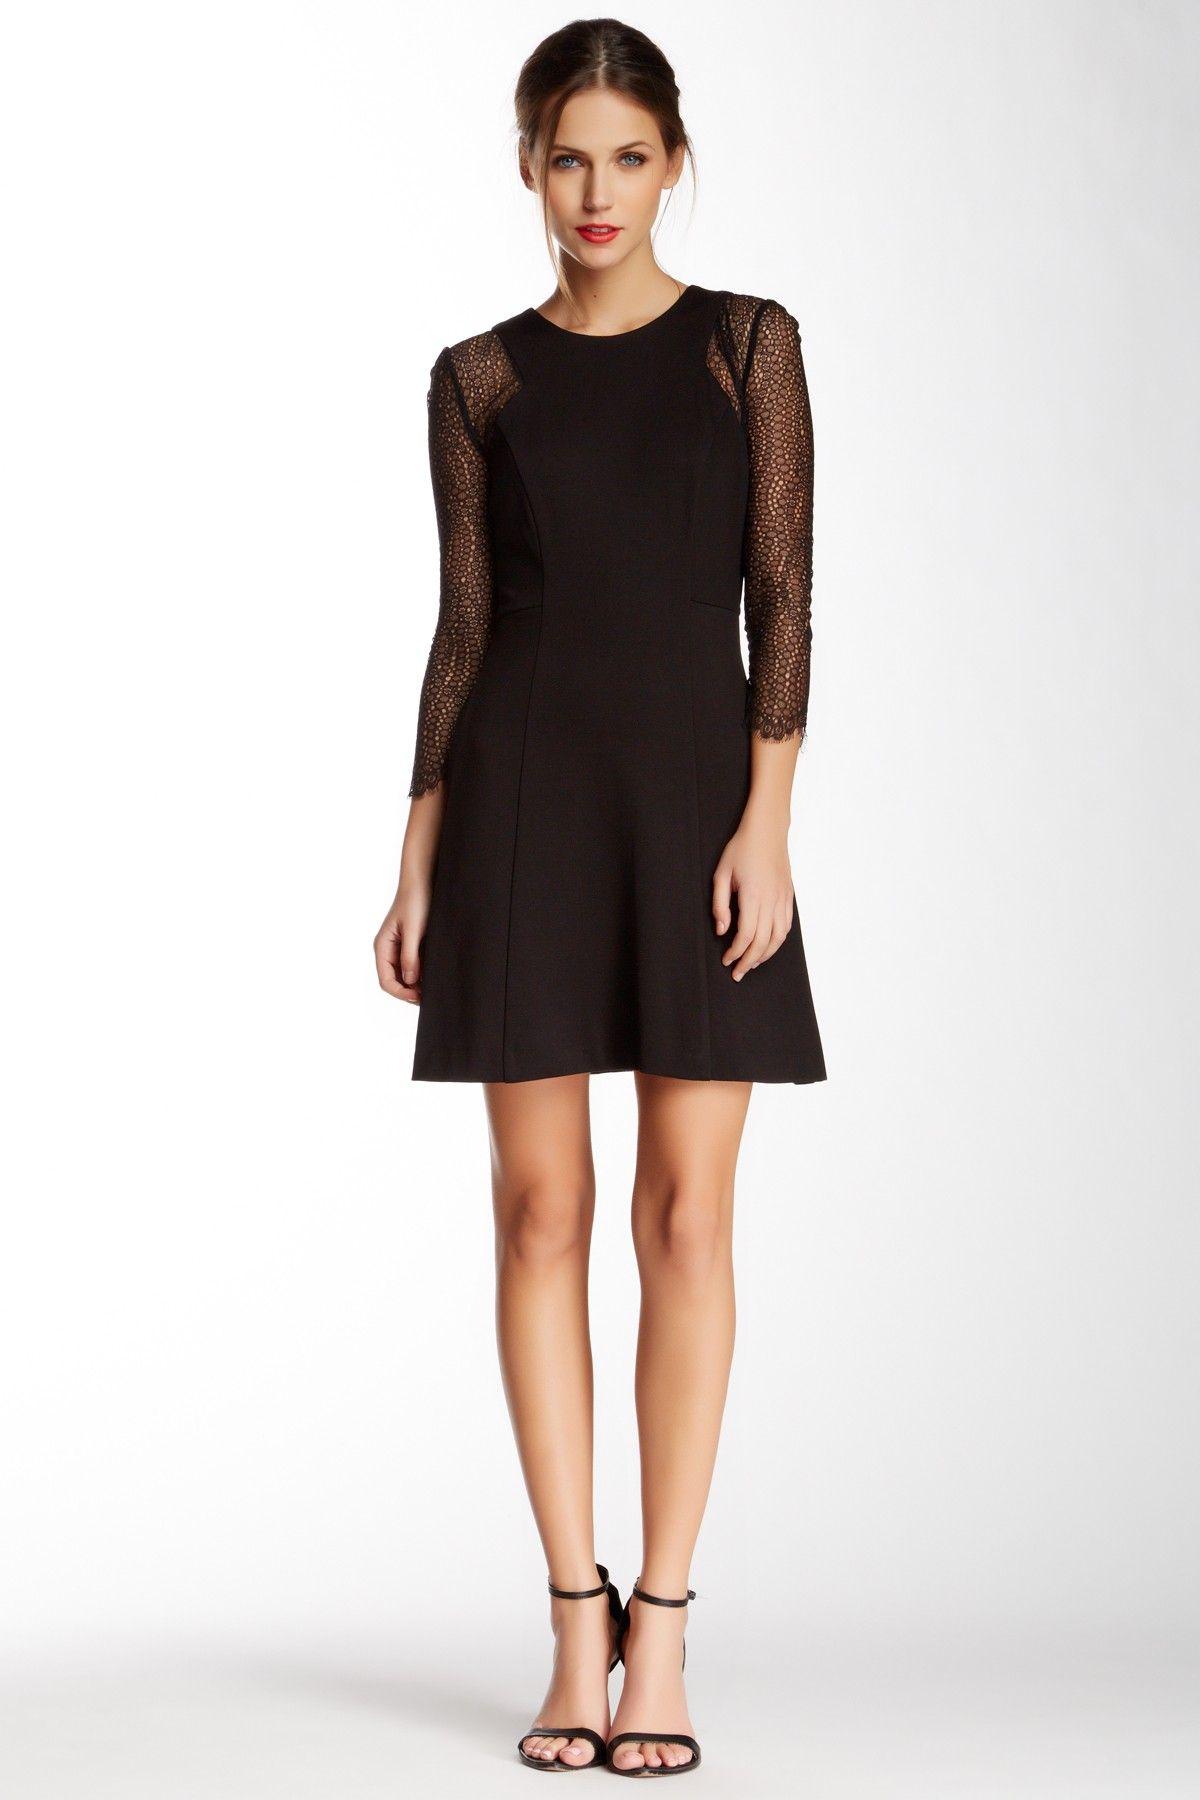 Style Inspiration Wear A Lace Shirt Under A Sleeveless Dress 06